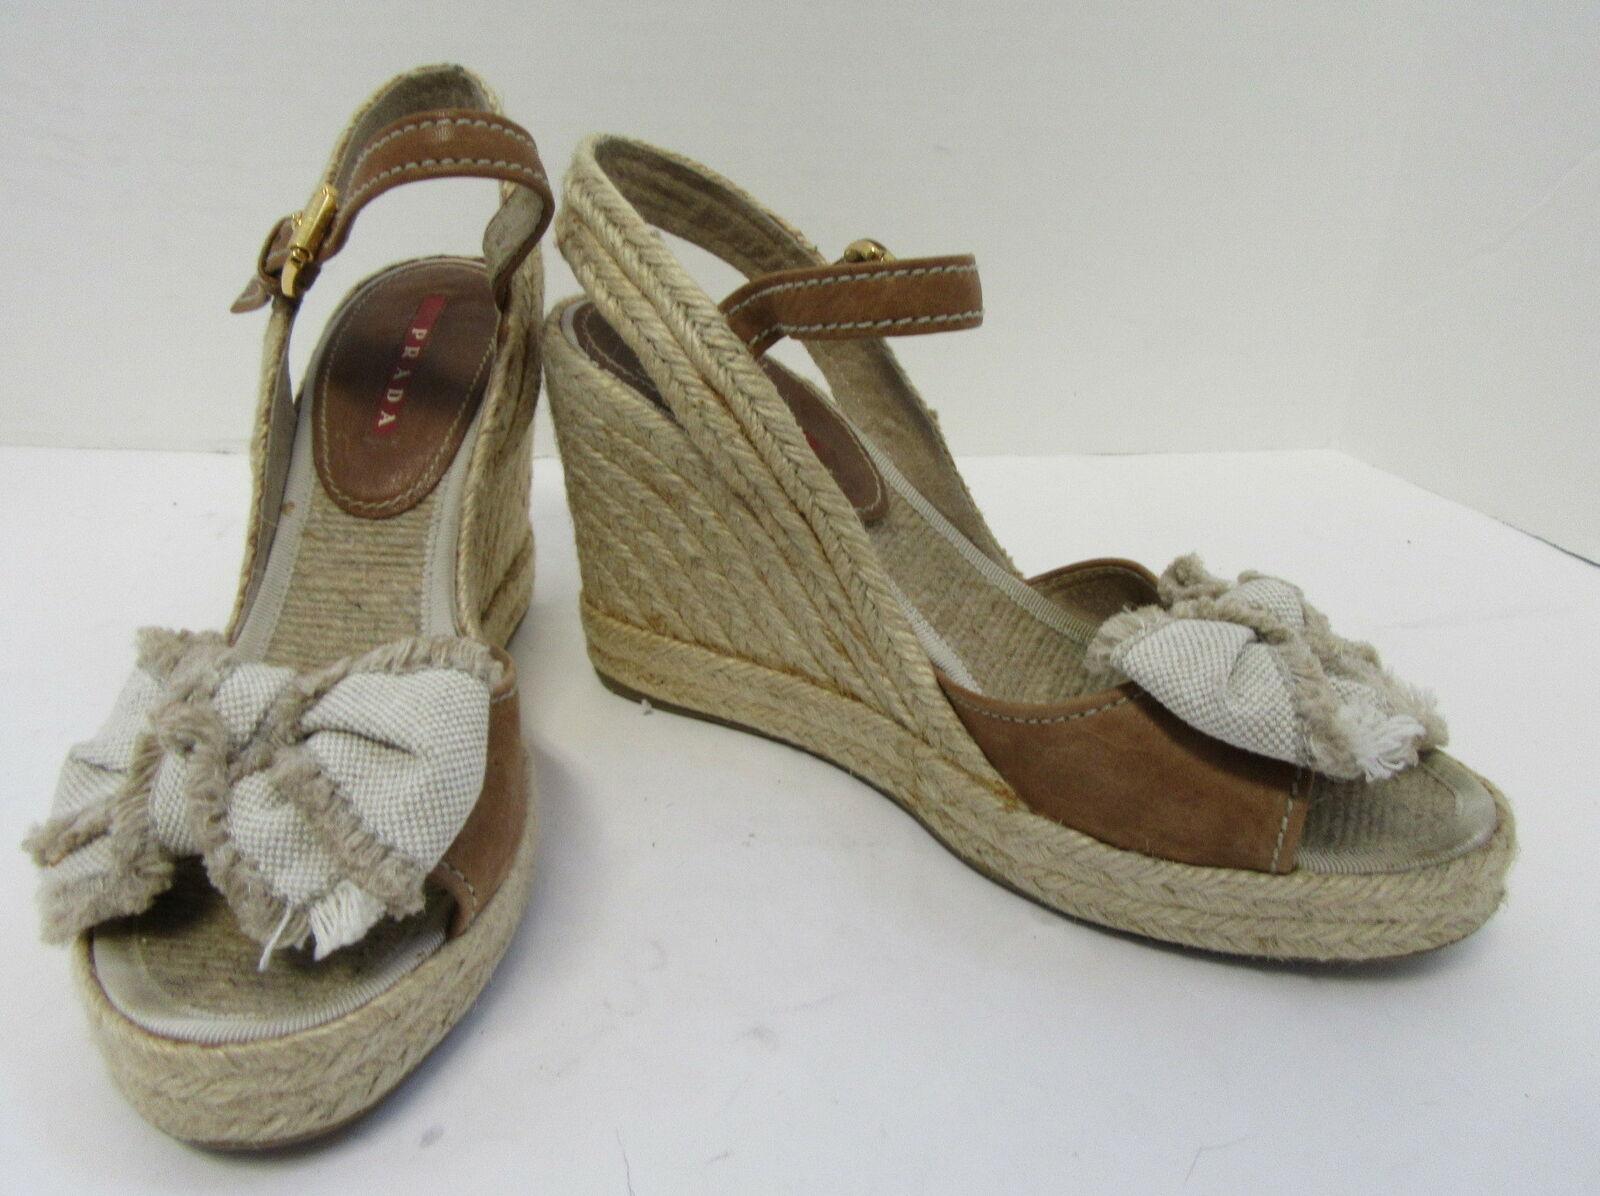 PRADA Camel Ankle Strap Espadrille Wedges with Burlap Fringe Bow Size 38